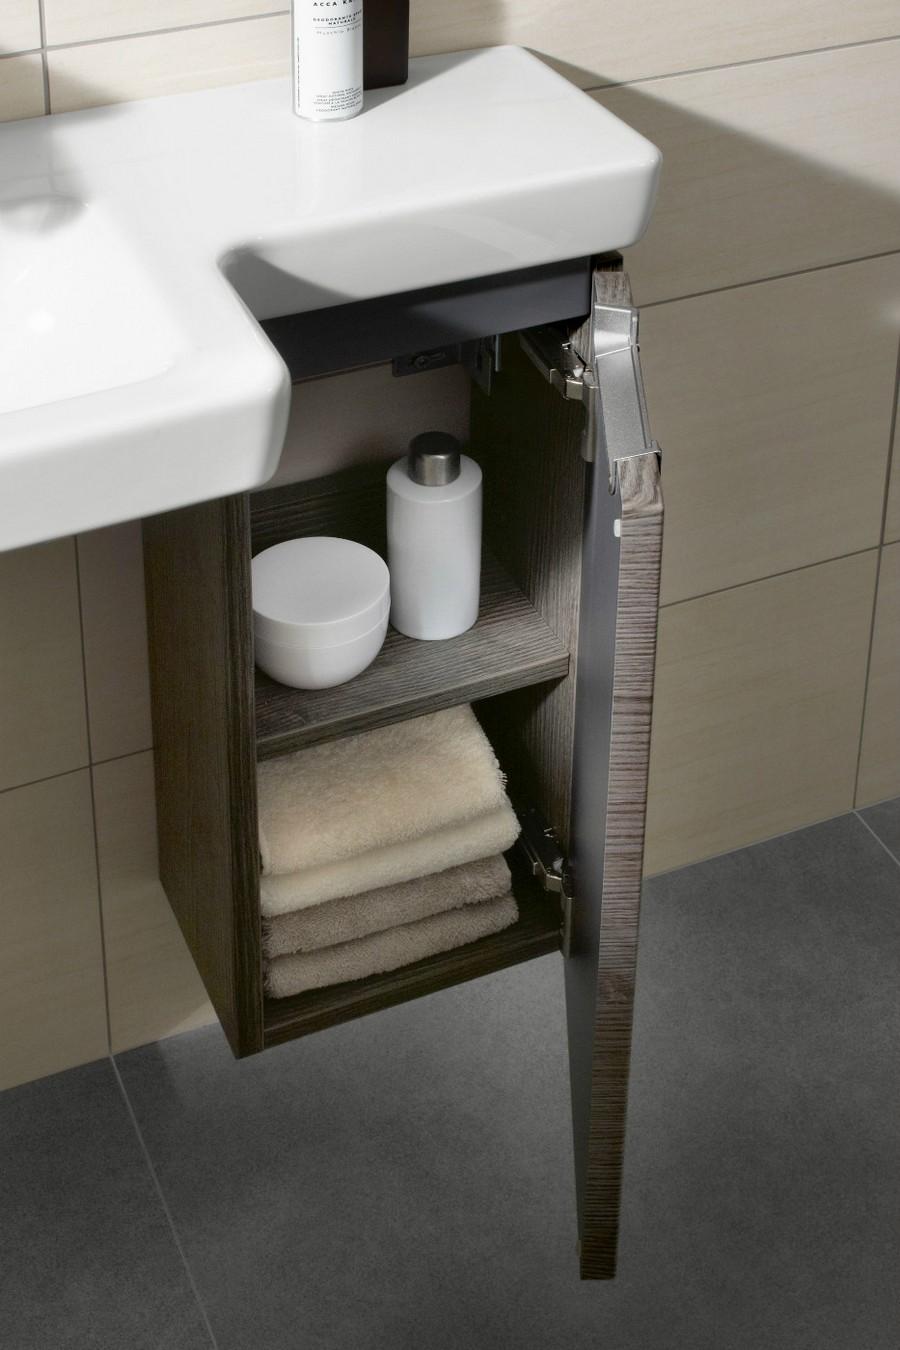 4-4-Villeroy-&-Boch-beige-bathroom-interior-design-wash-basin-vanity-unit-narrow-wall-mounted-cabinet-with-two-shelves-towel-accessories-storage